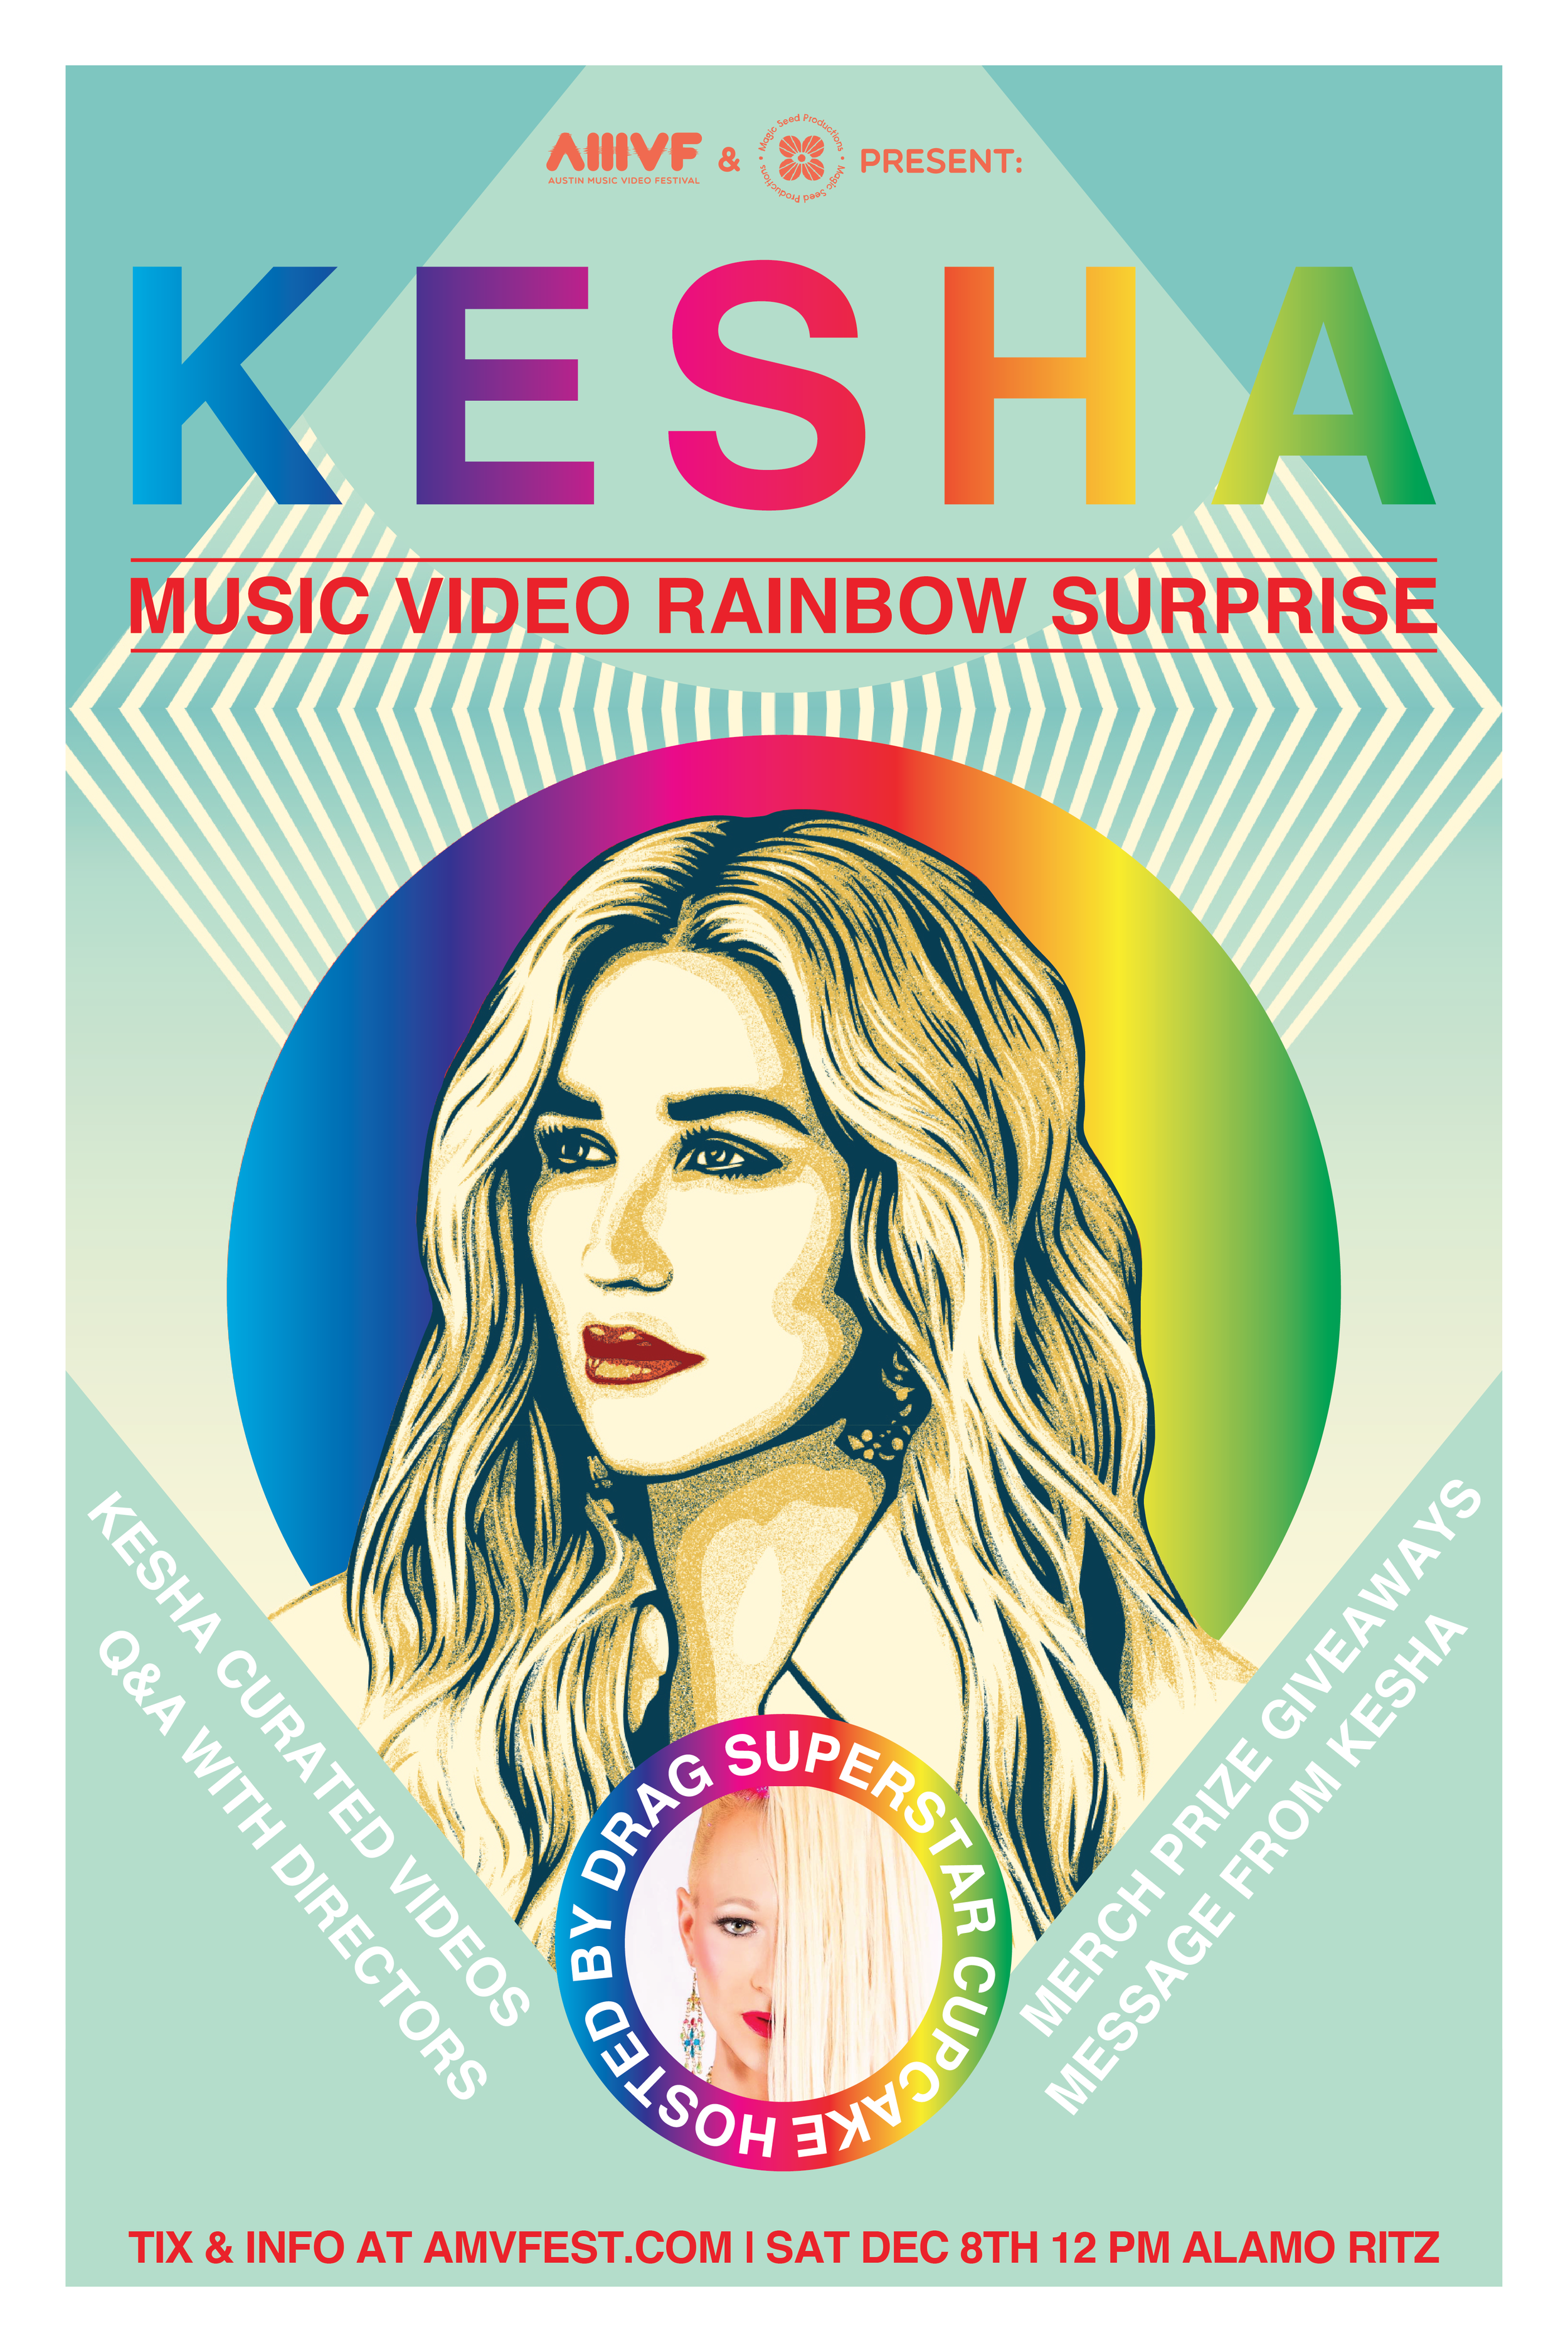 Kesha Music Video Surprise @AMVF